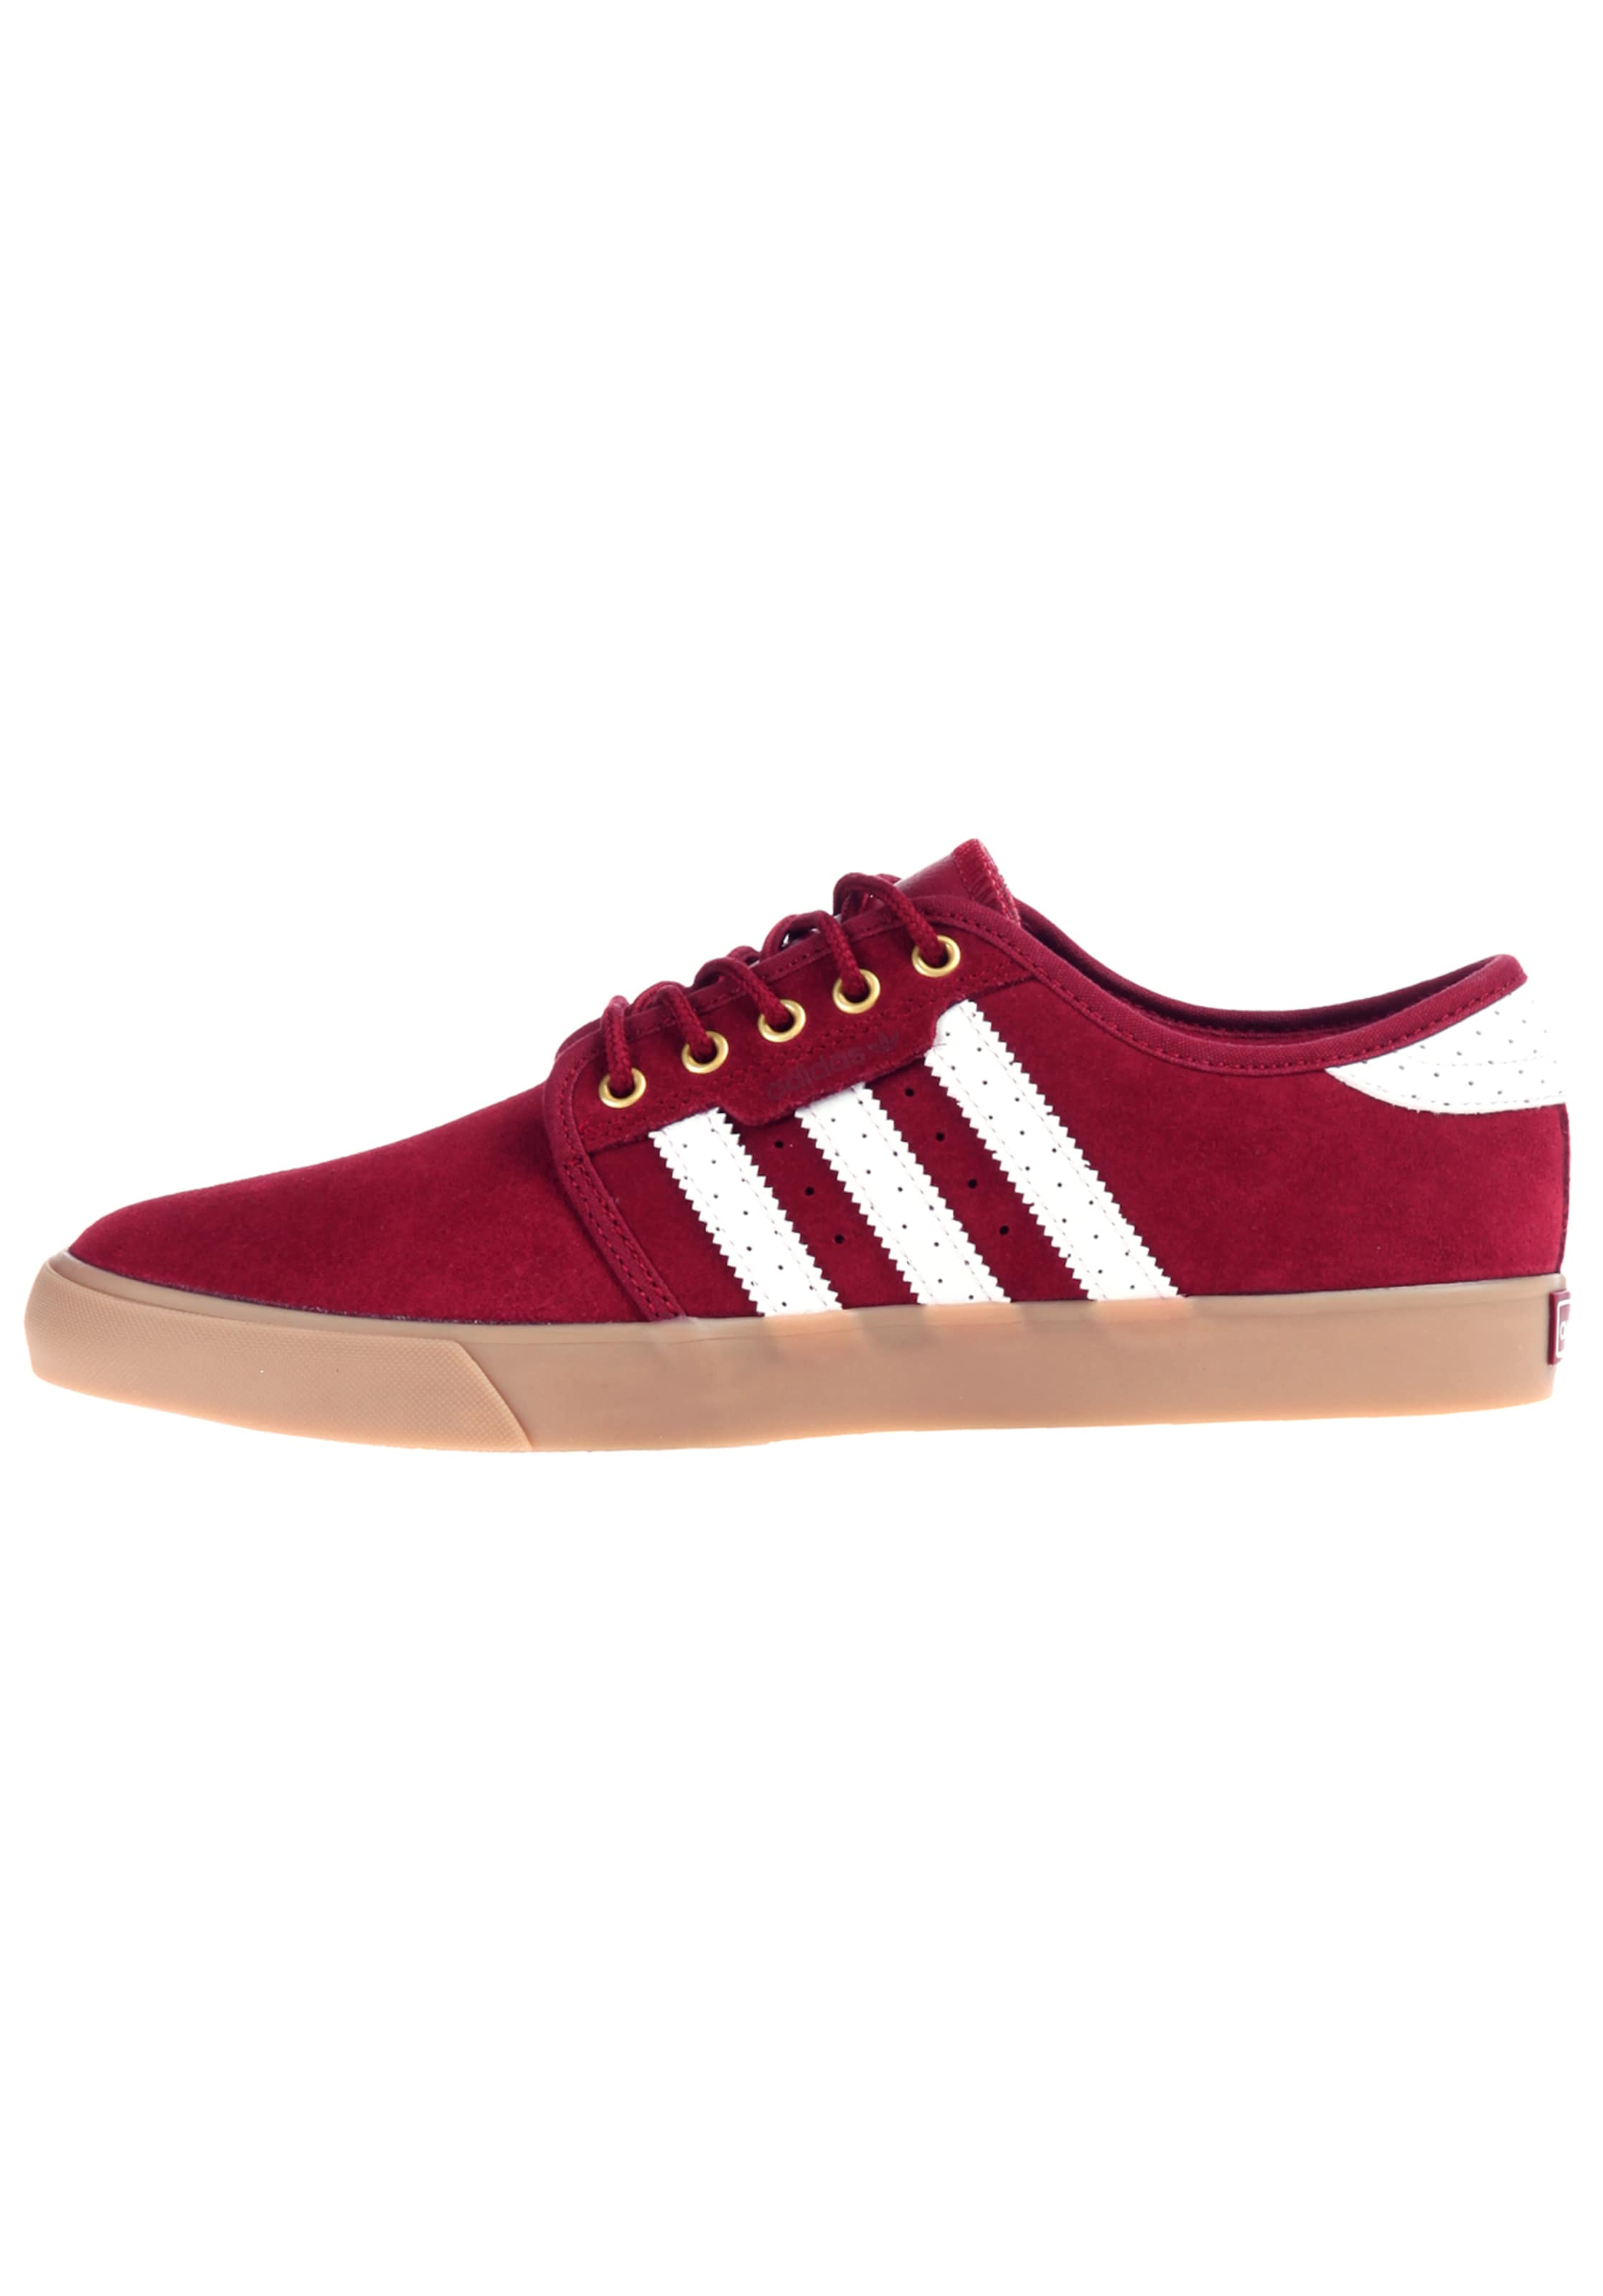 ADIDAS ORIGINALS  Seeley  Sneaker